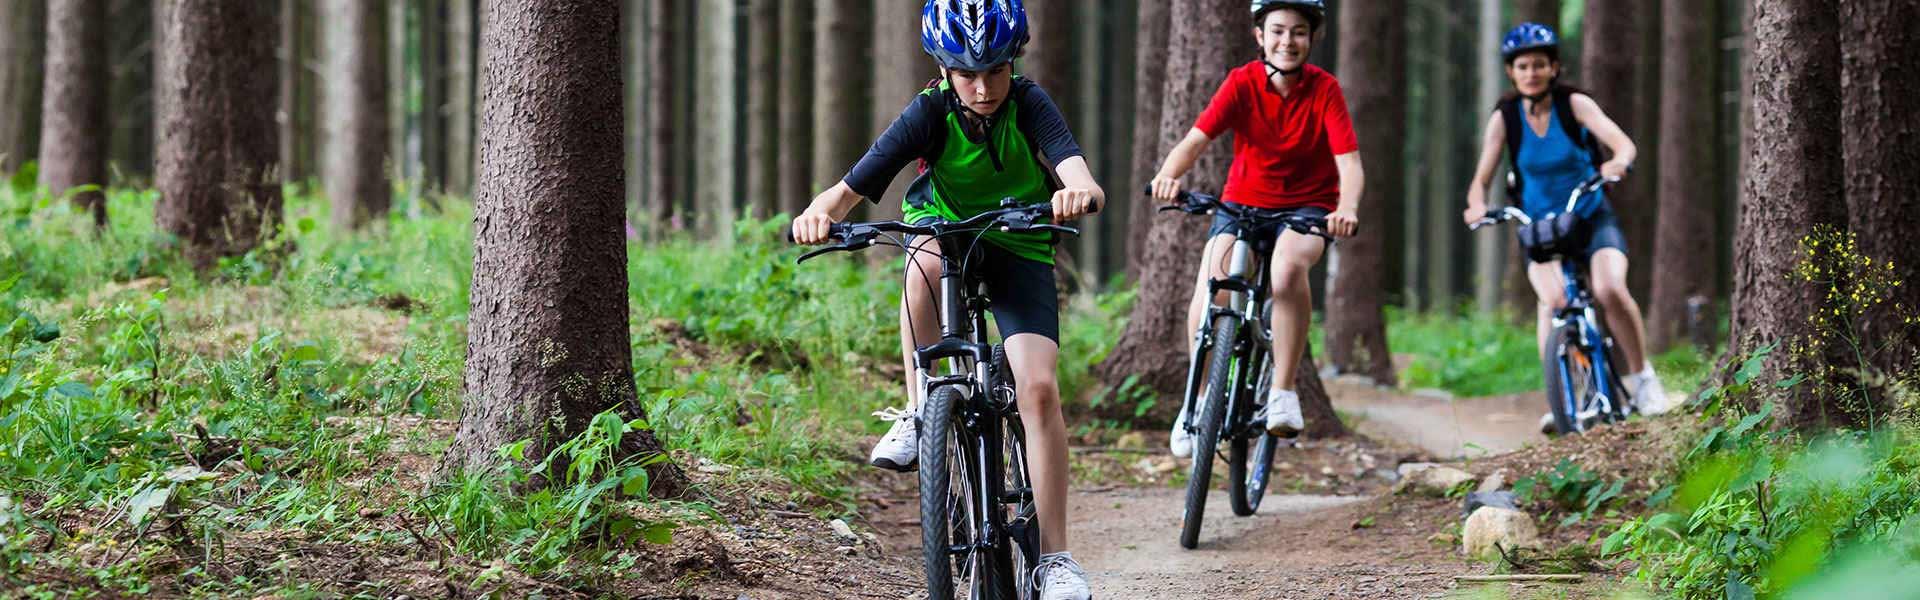 family-bike-ride-1